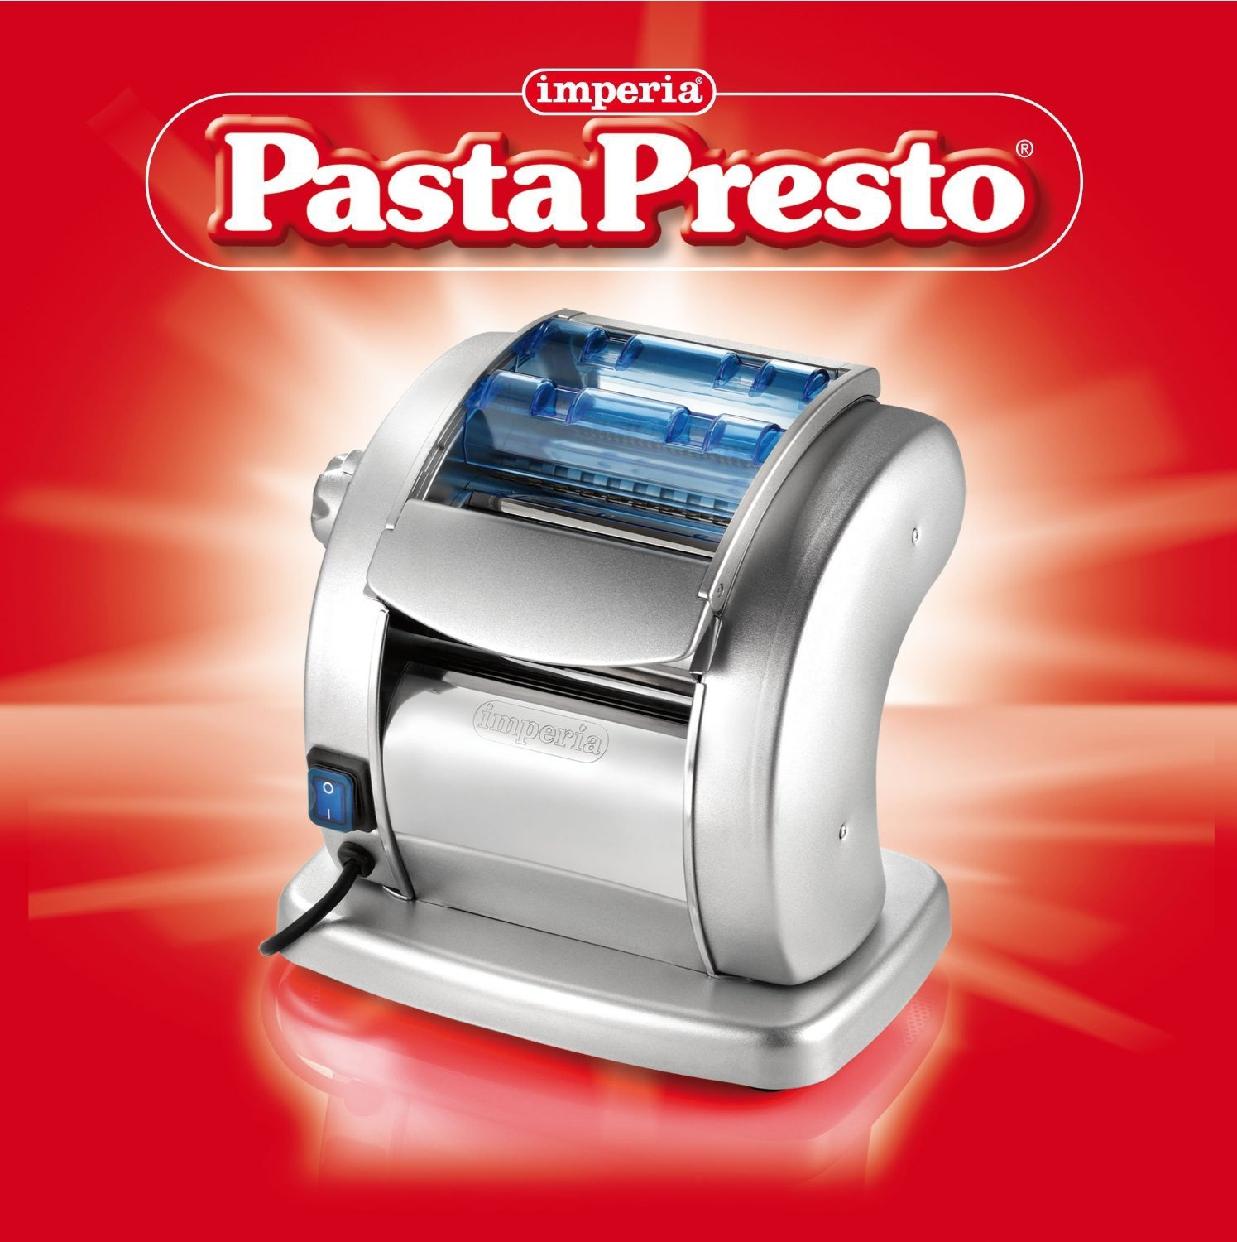 inperia(インペリア) パスタマシン モデル720の商品画像2